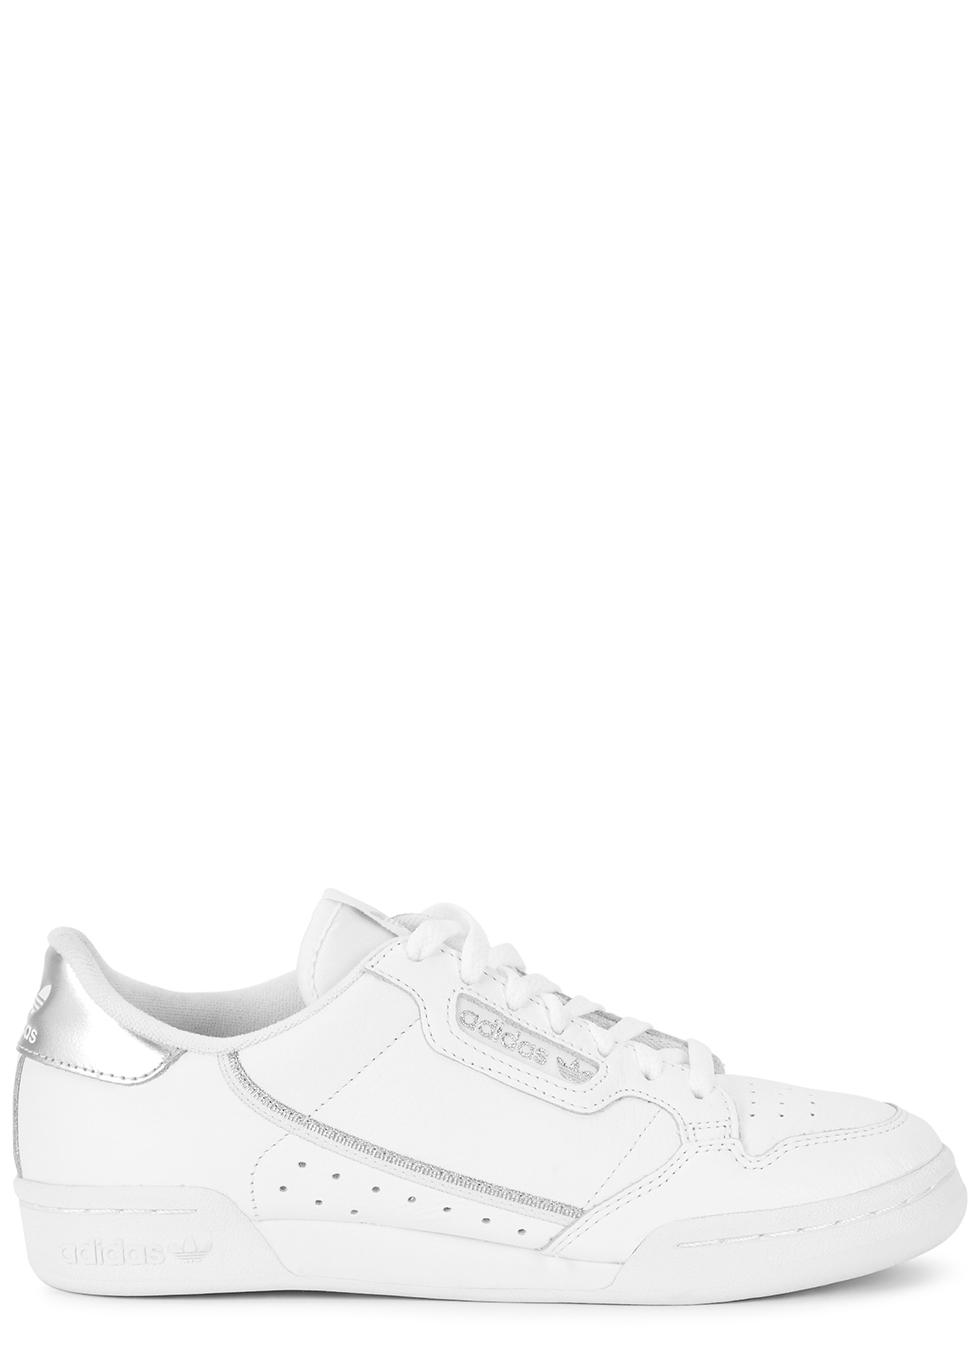 ADIDAS ORIGINALS Continental 80 white